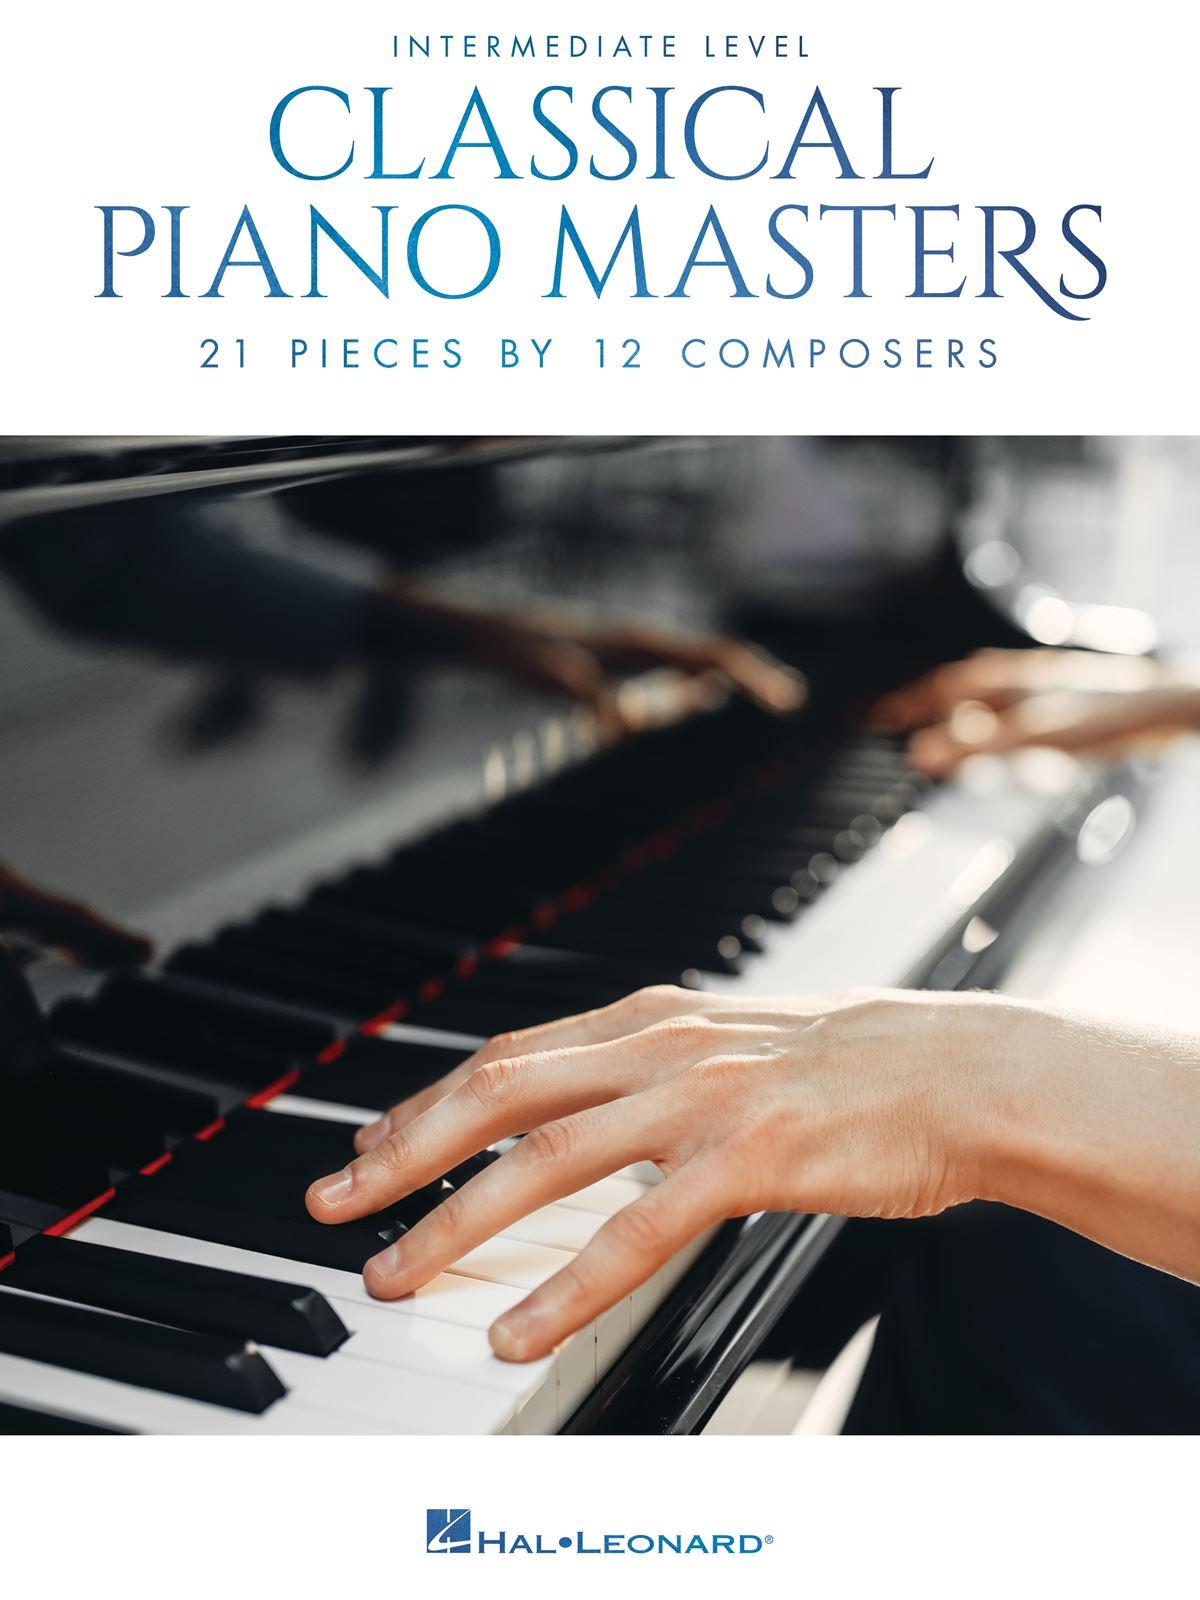 Classical Piano Masters: Intermediate